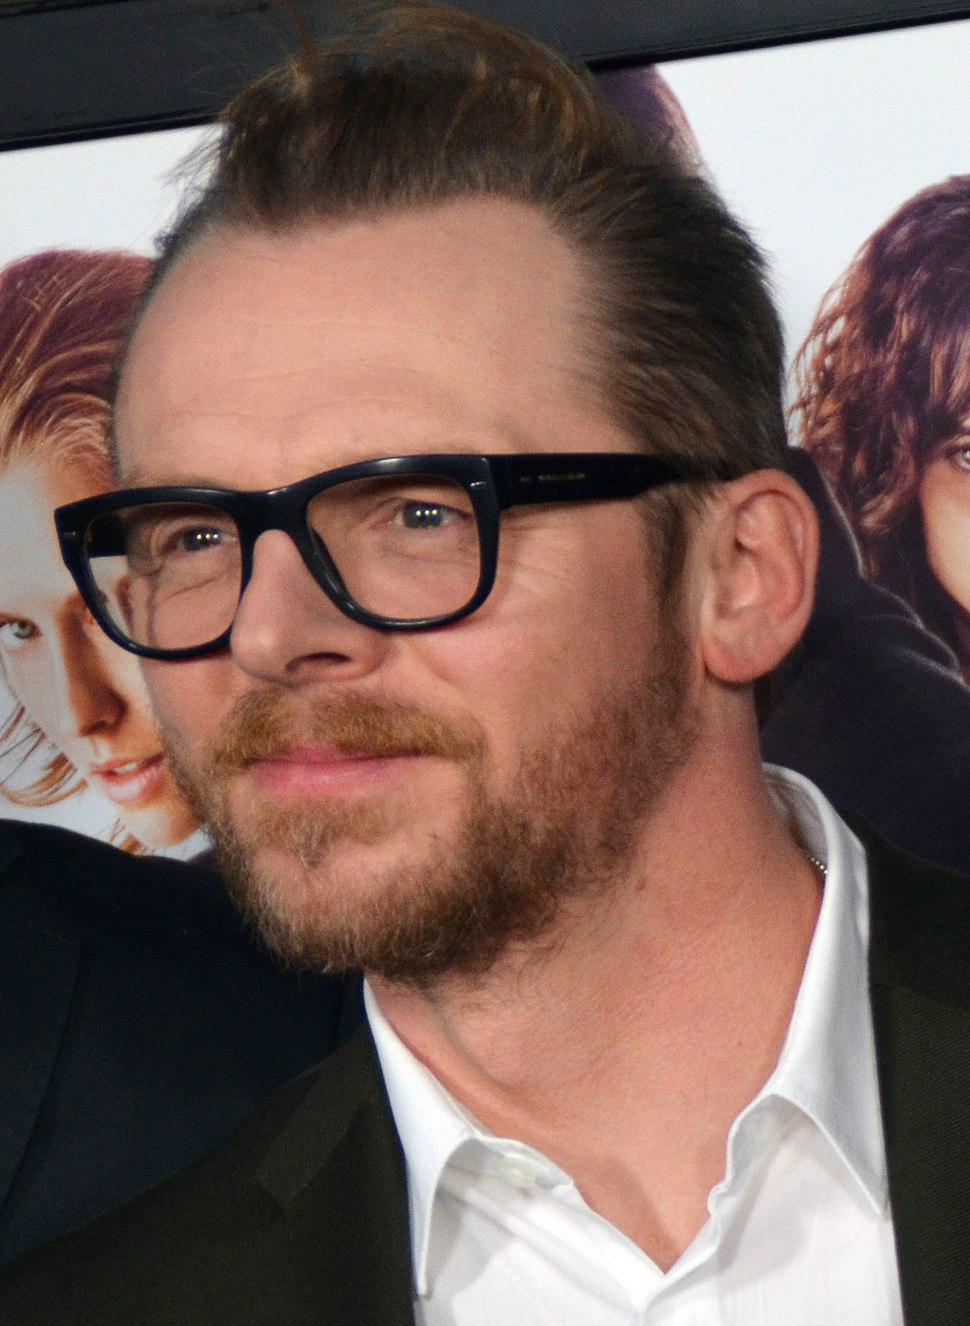 Simon Pegg Premiere of Kill Me Three Times (cropped)